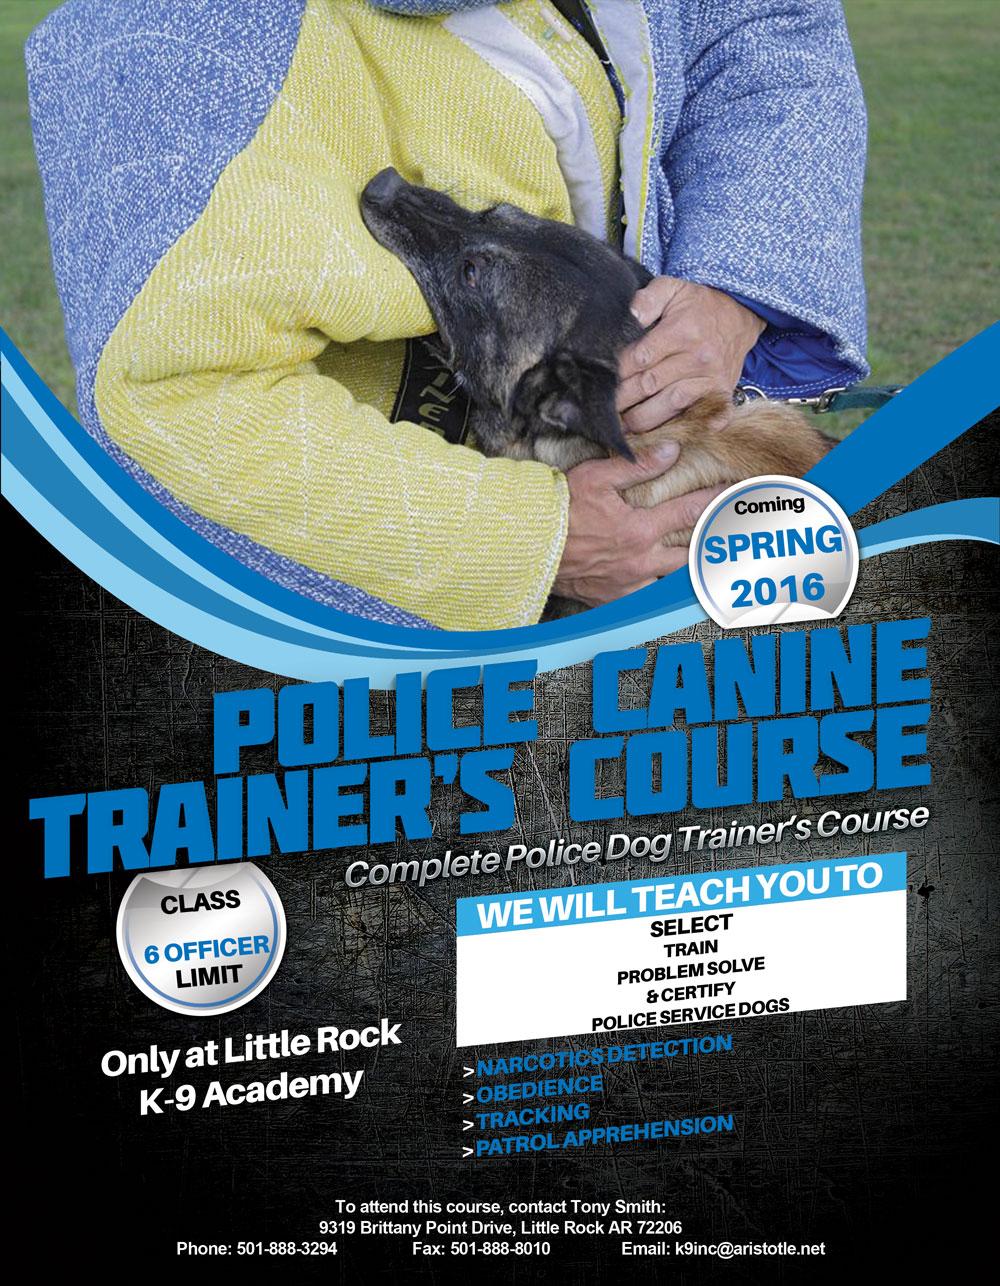 LRK9-Training-AnnouncementSPRING-2016-